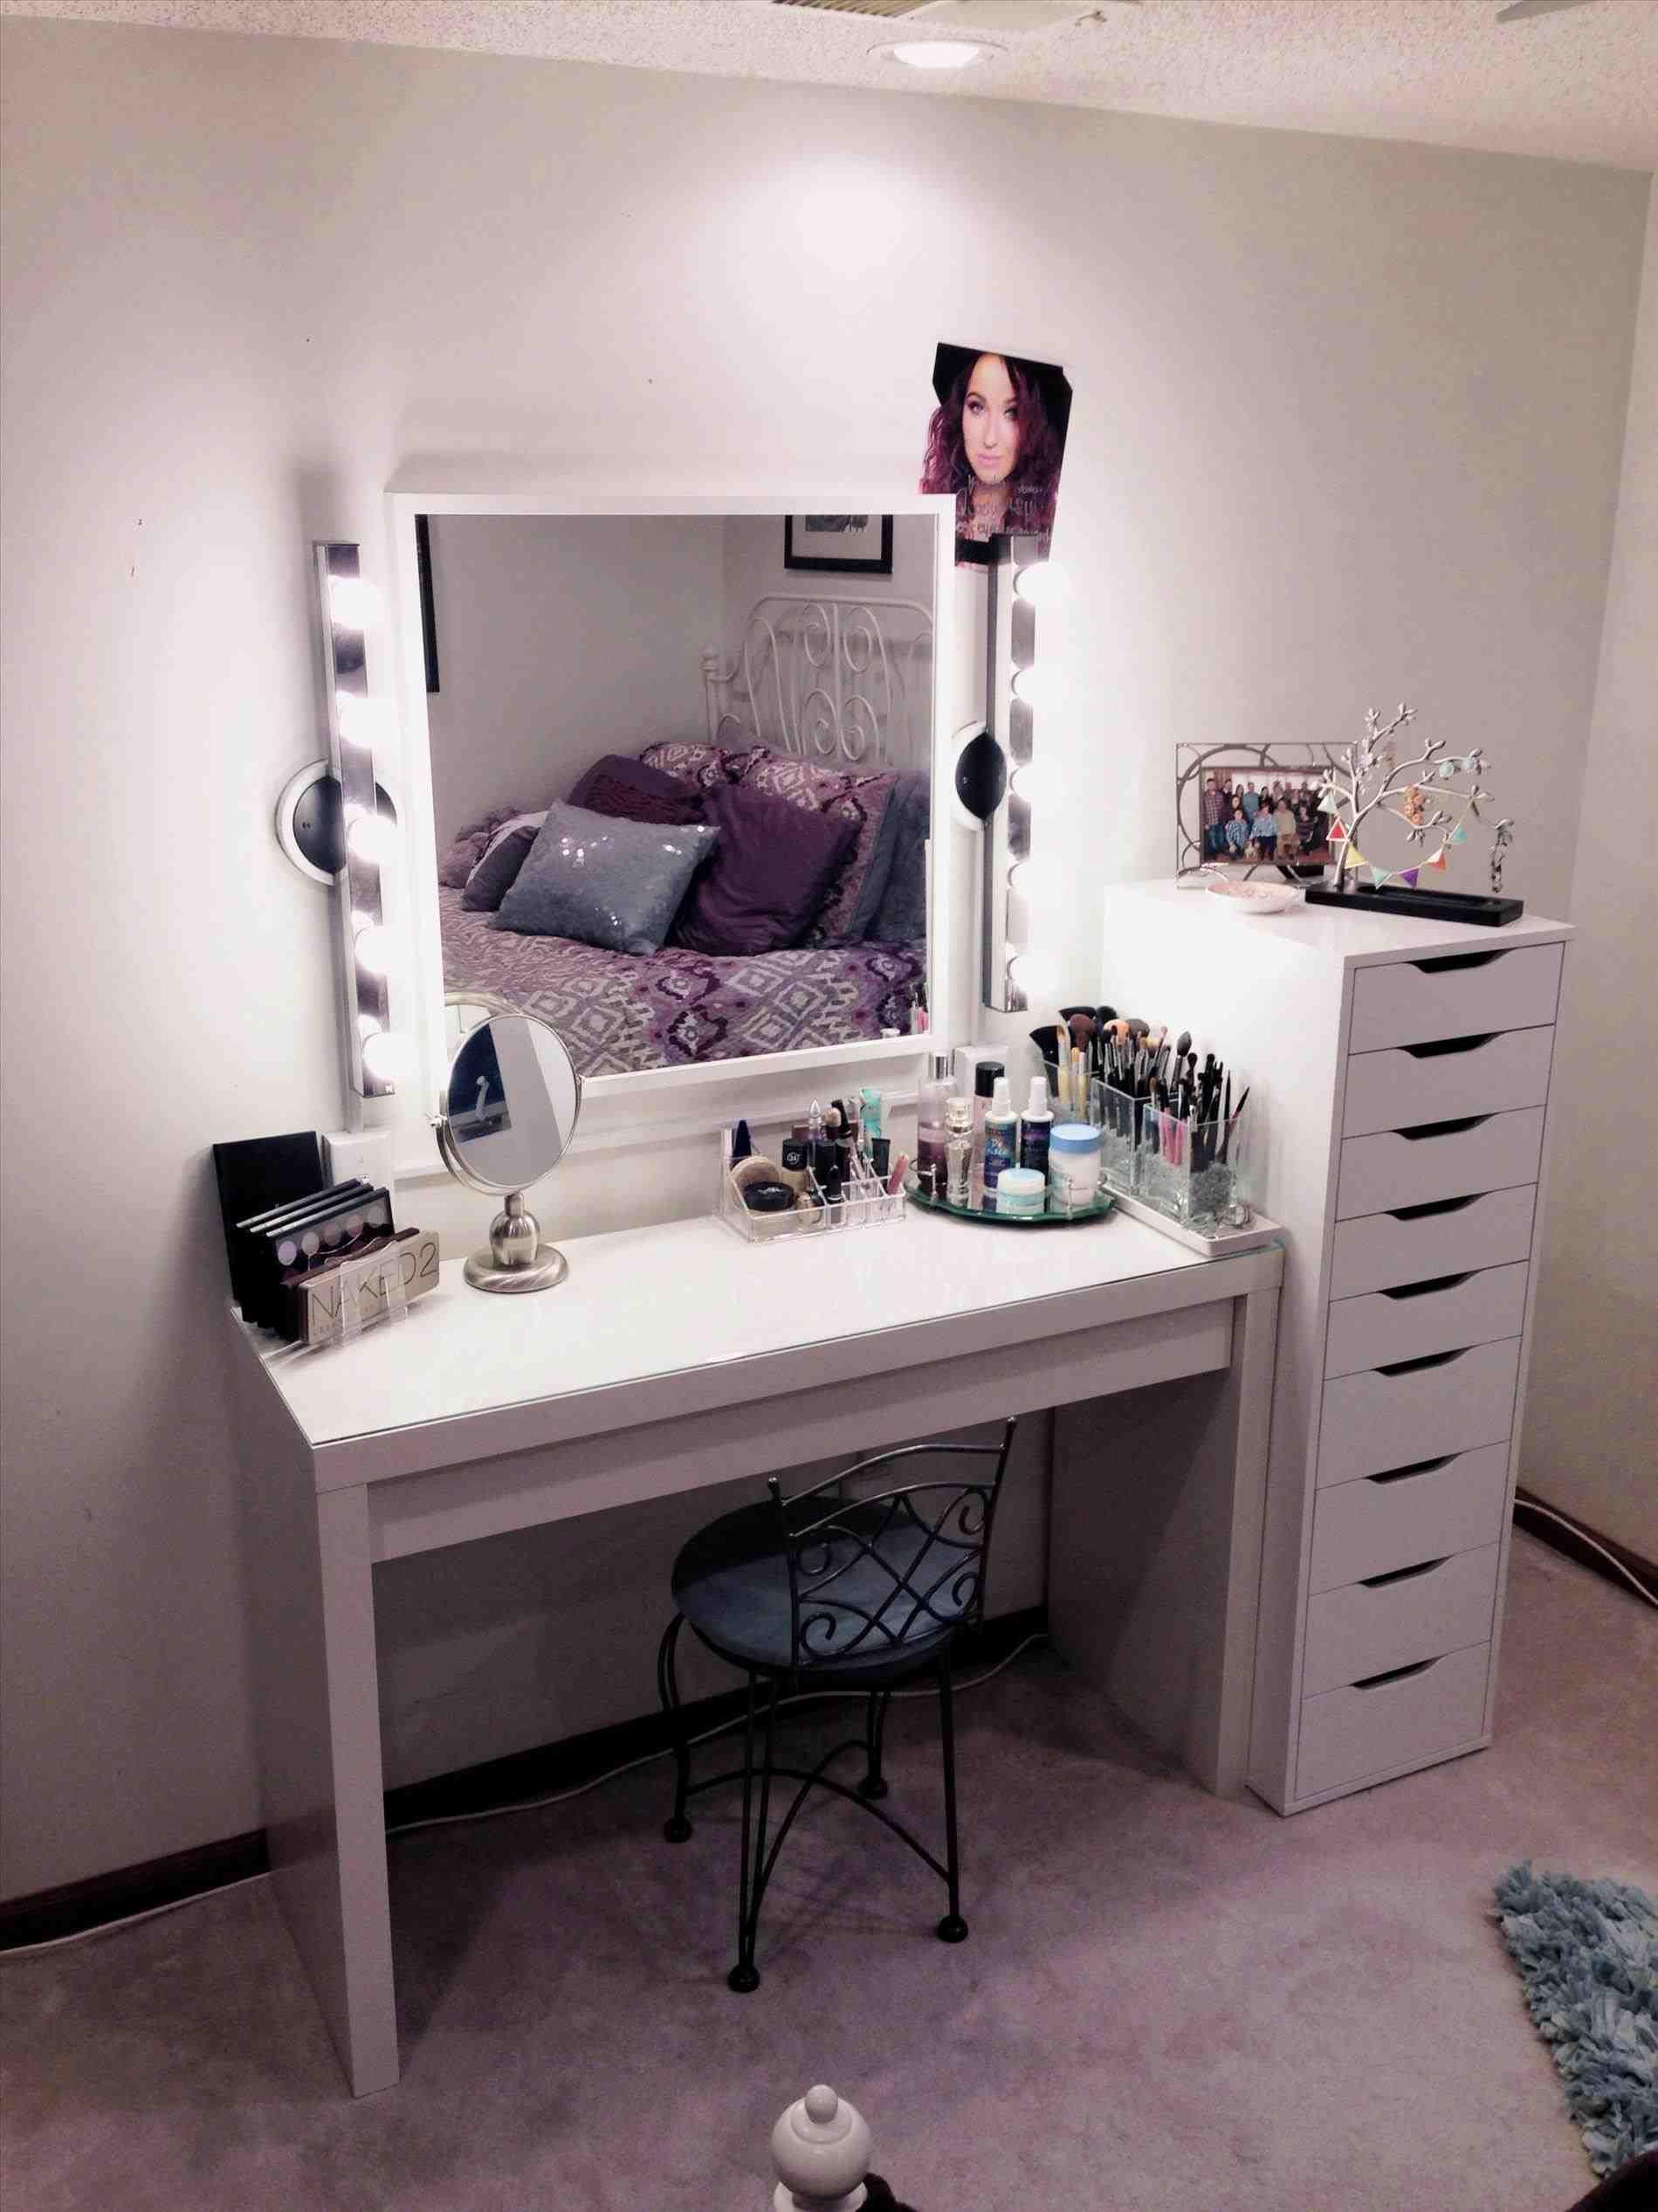 This diy vanity table with lights vanity set ikea mirrored desk